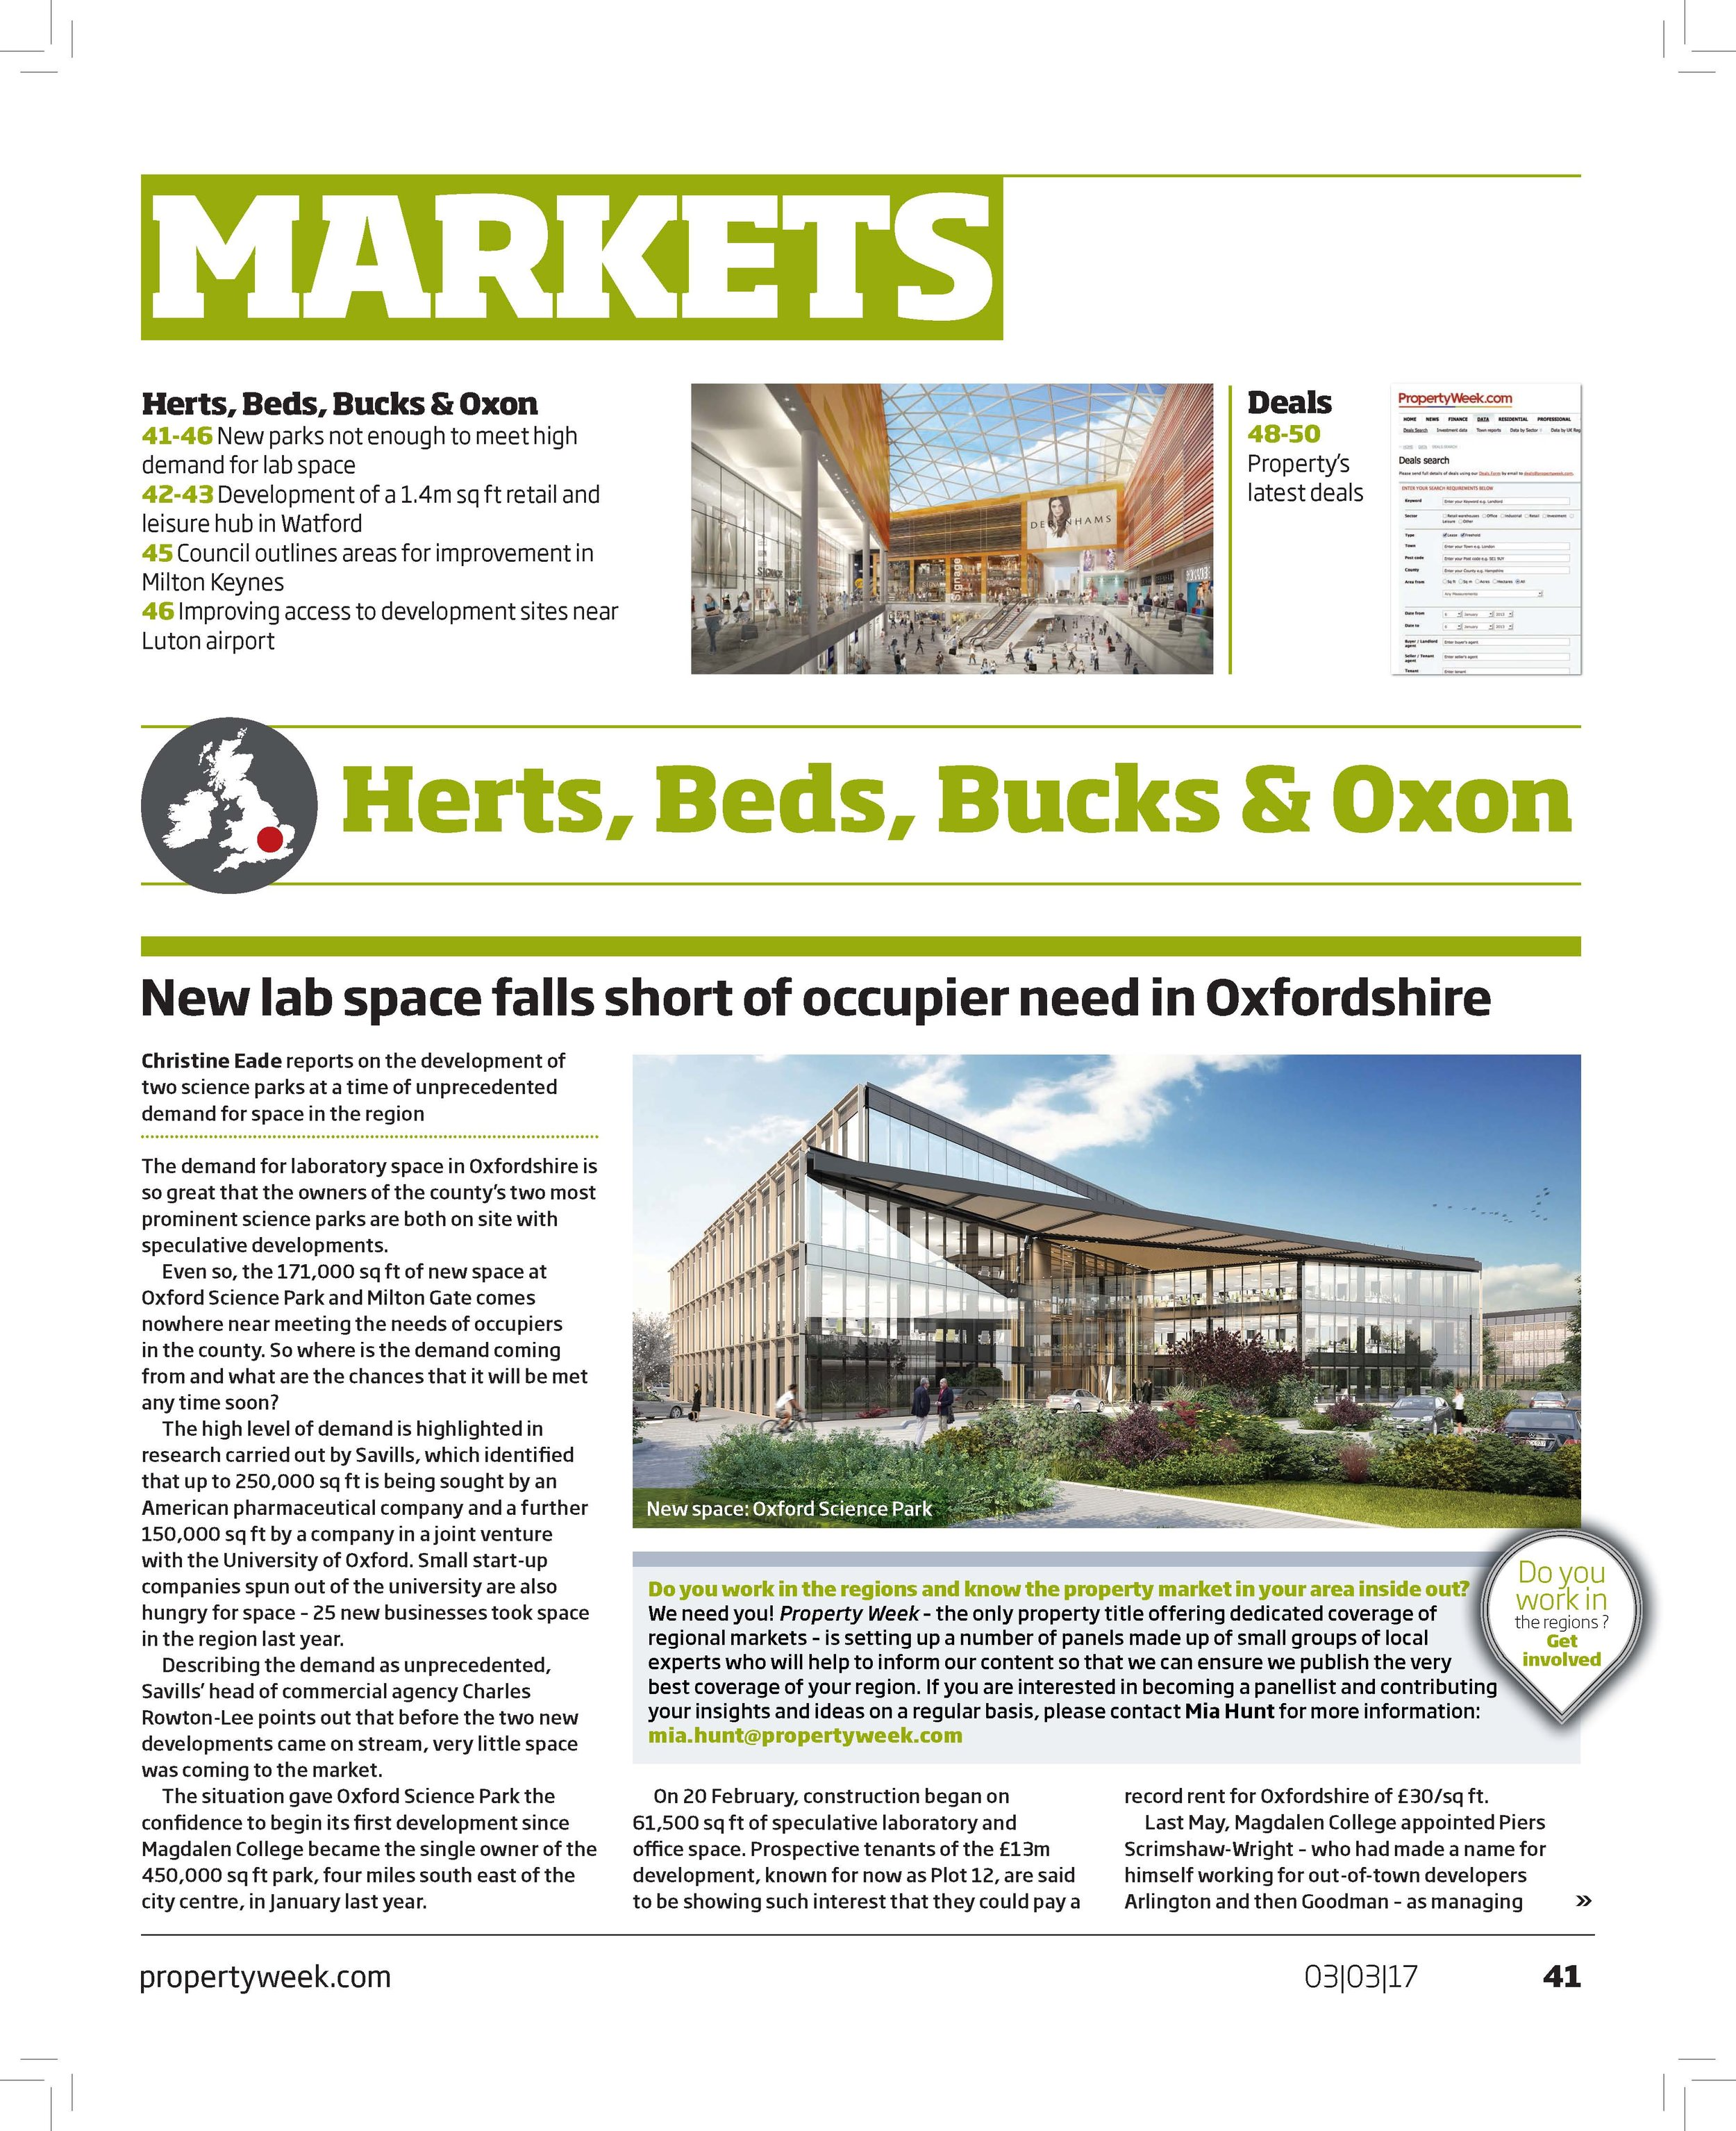 Oxford Science Park, Property Week digital pdf, 3 March 2017_Page_1.jpg